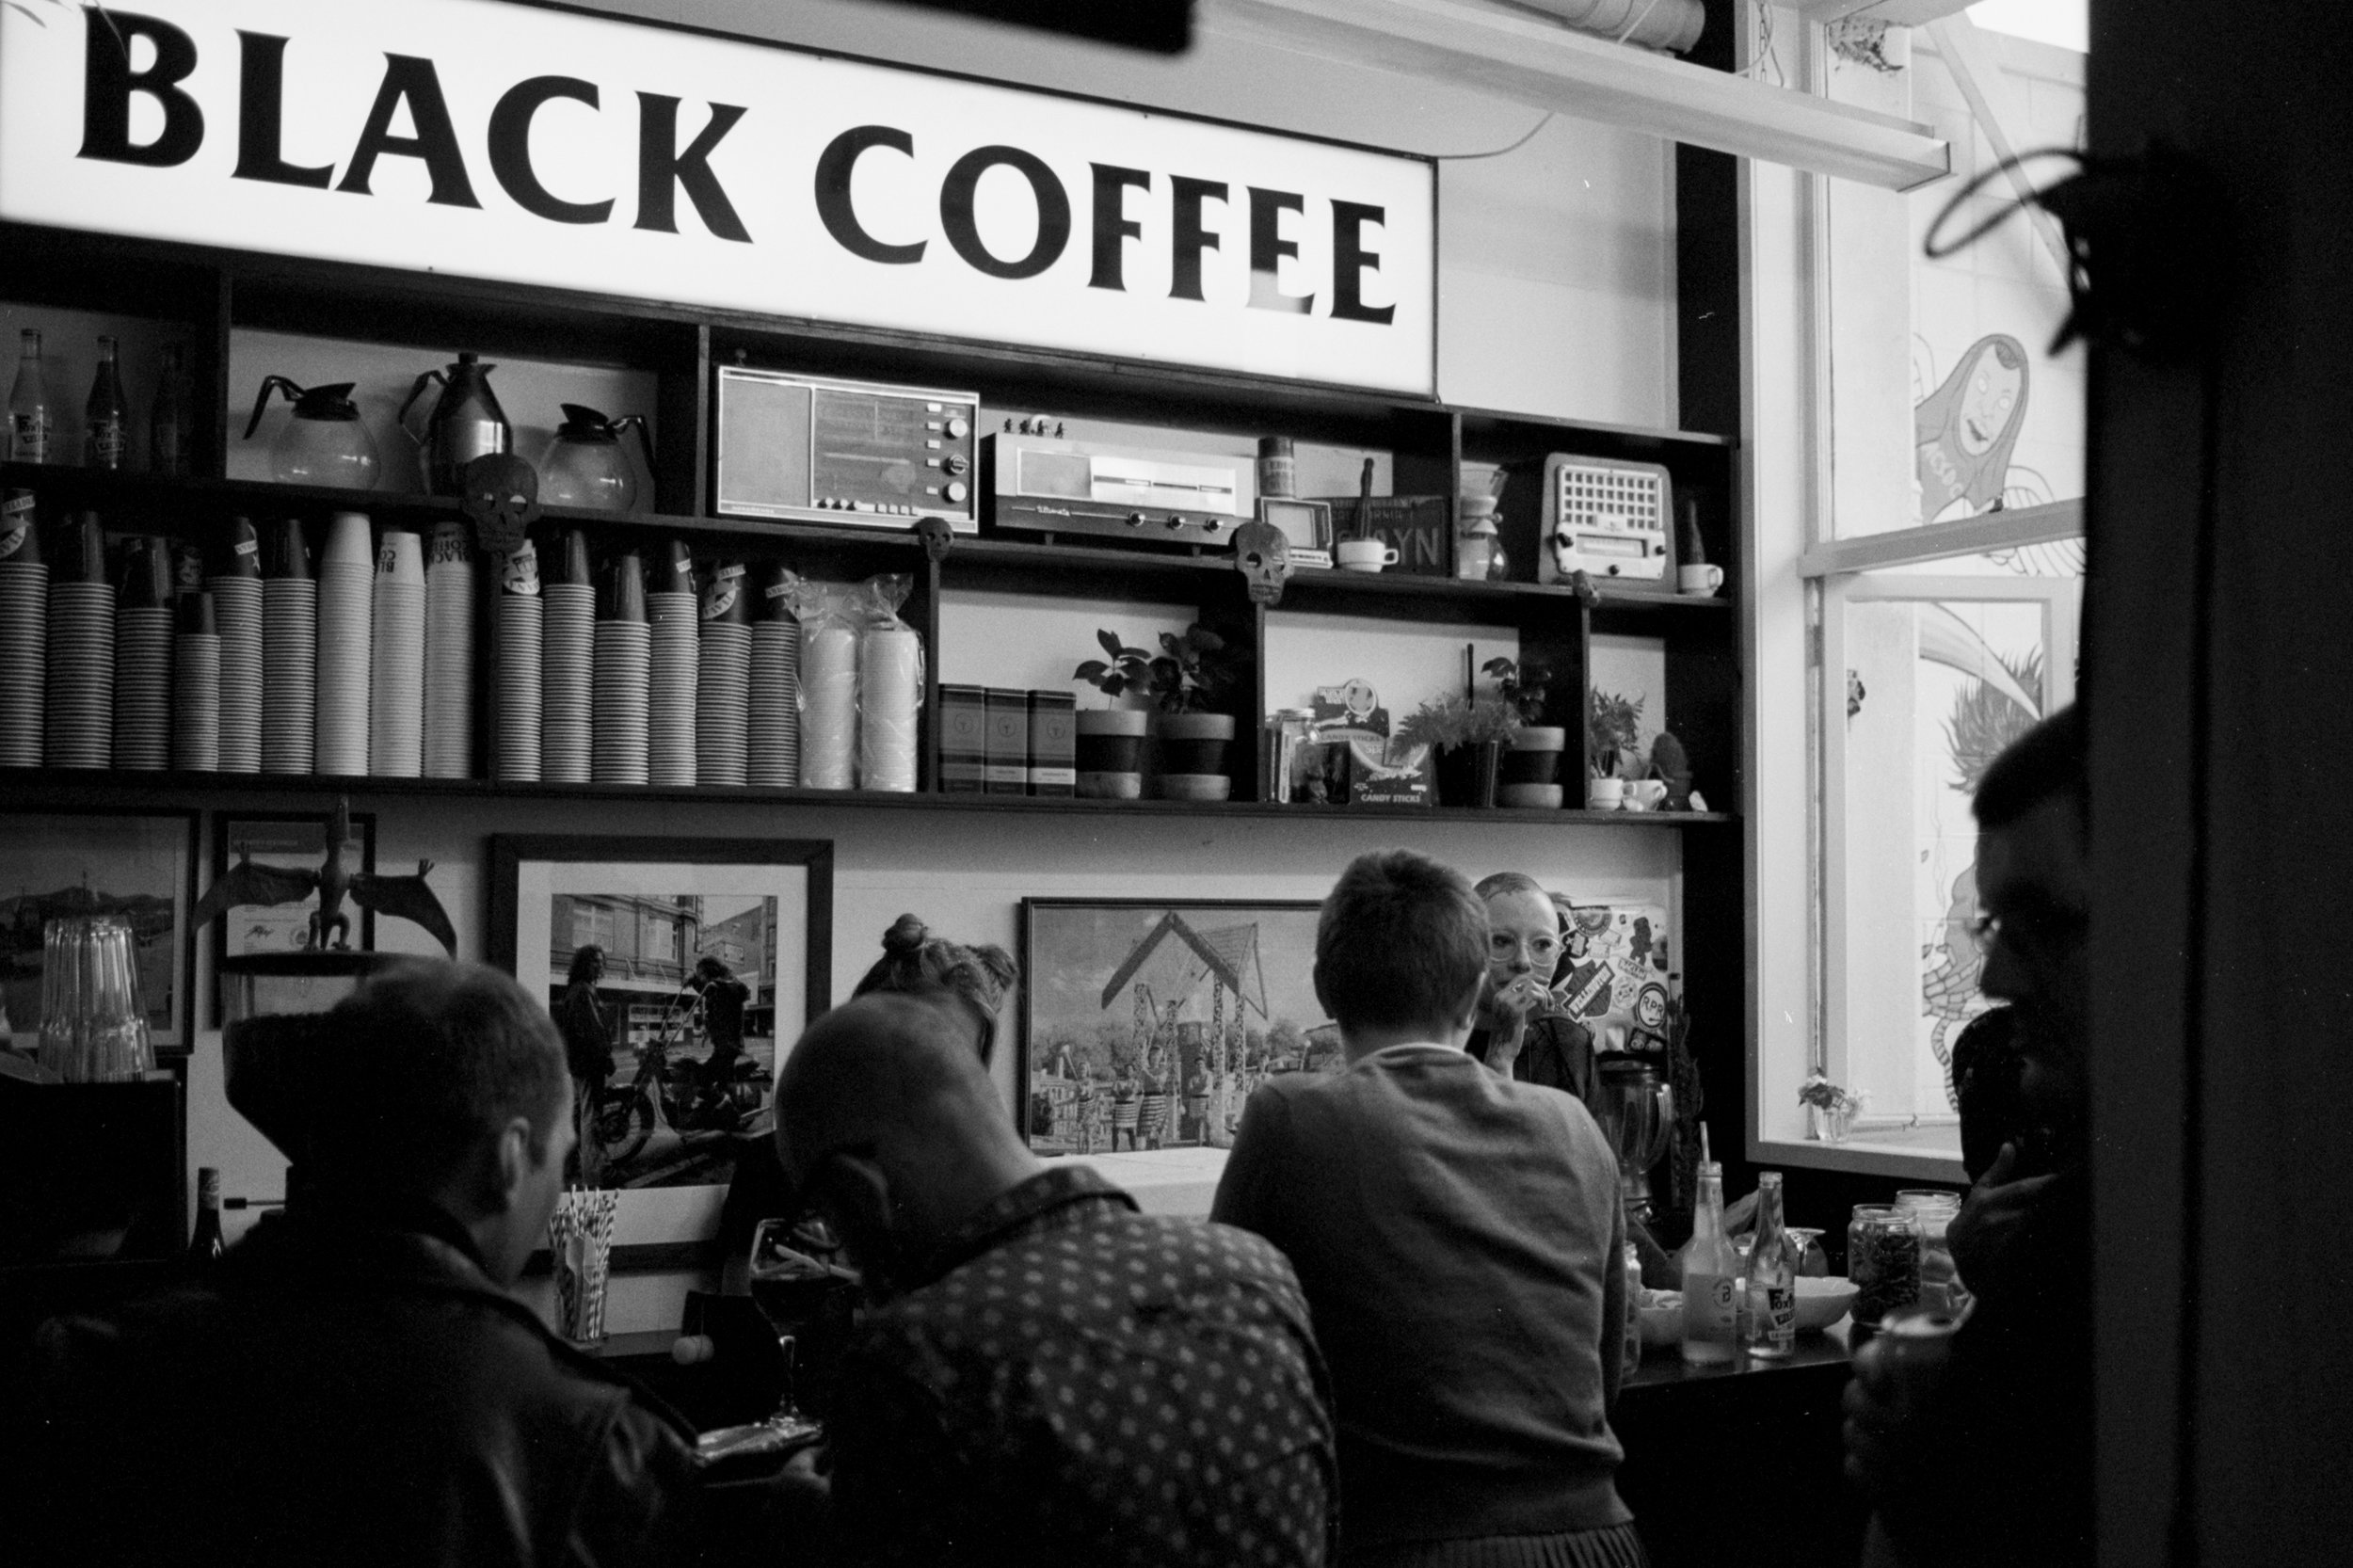 black_coffee_borderless_landscape (10).jpg